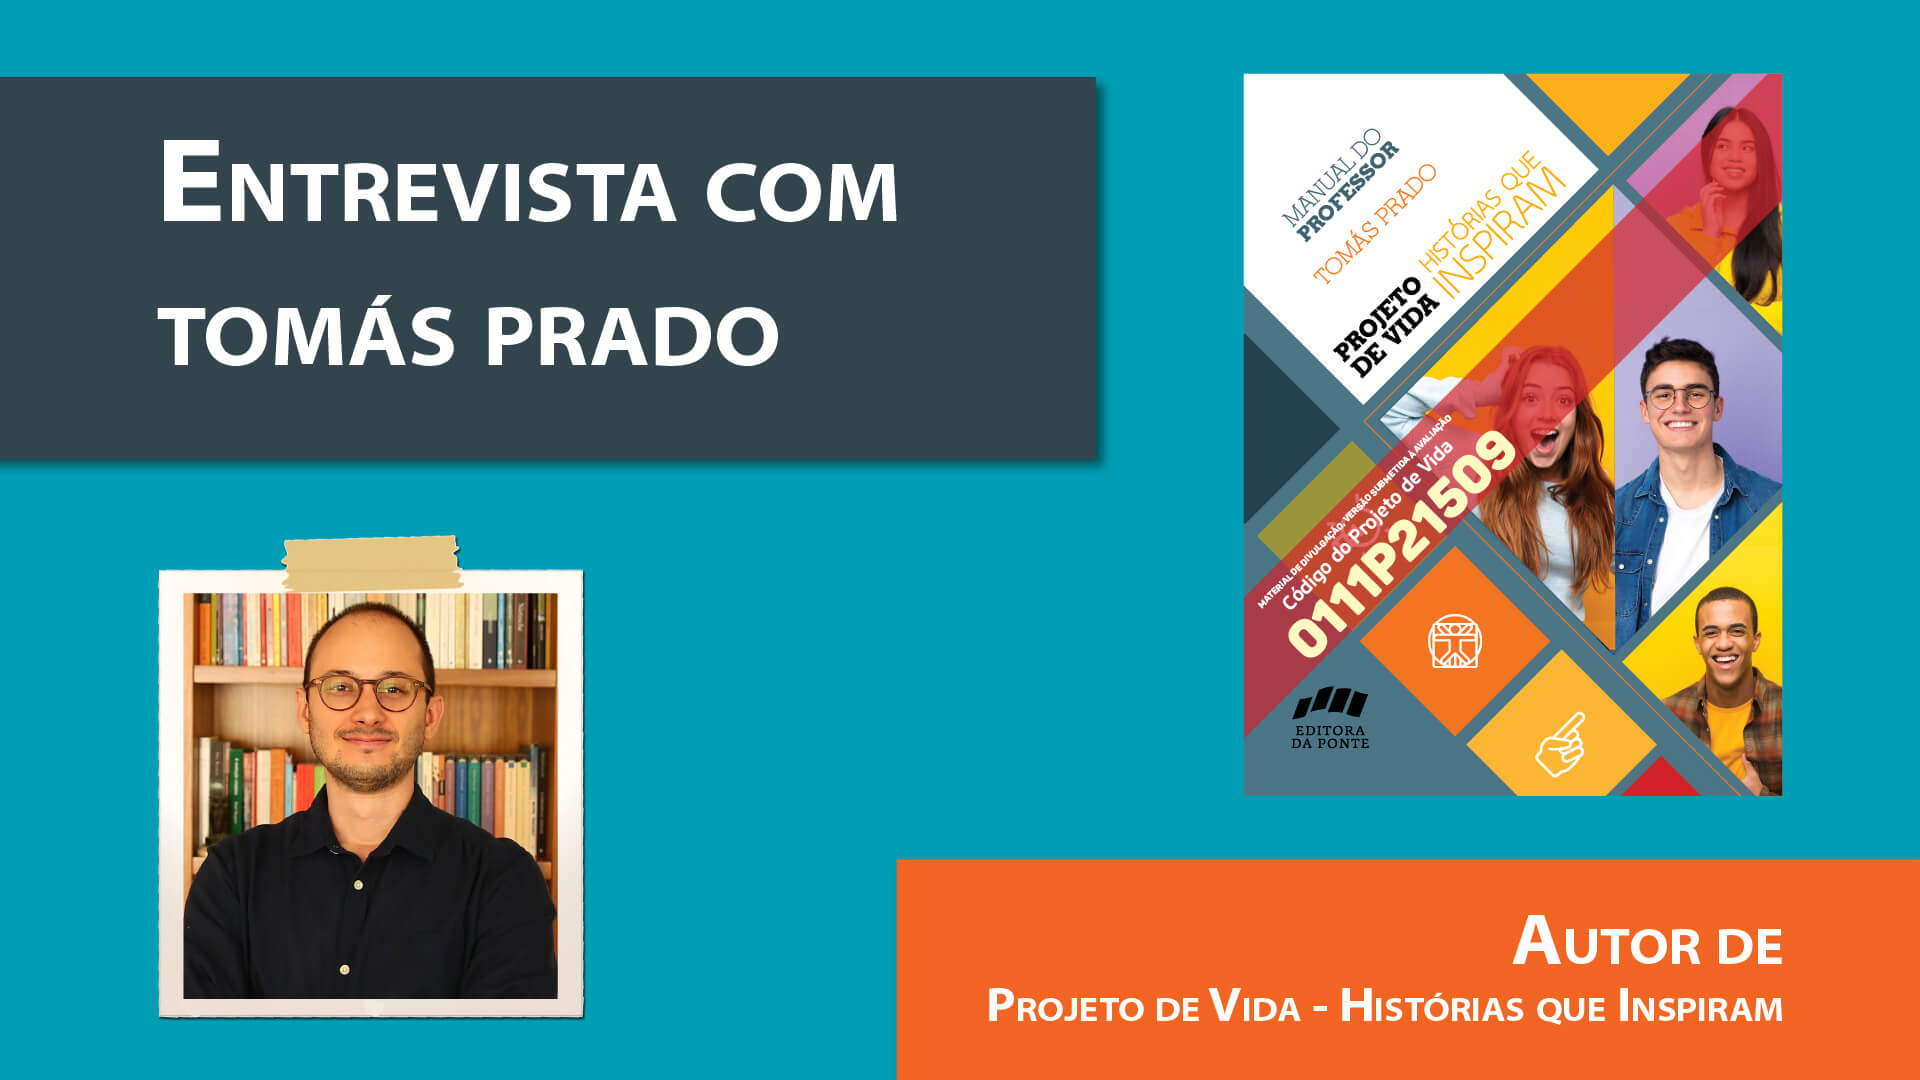 Entrevista com Tomás Prado